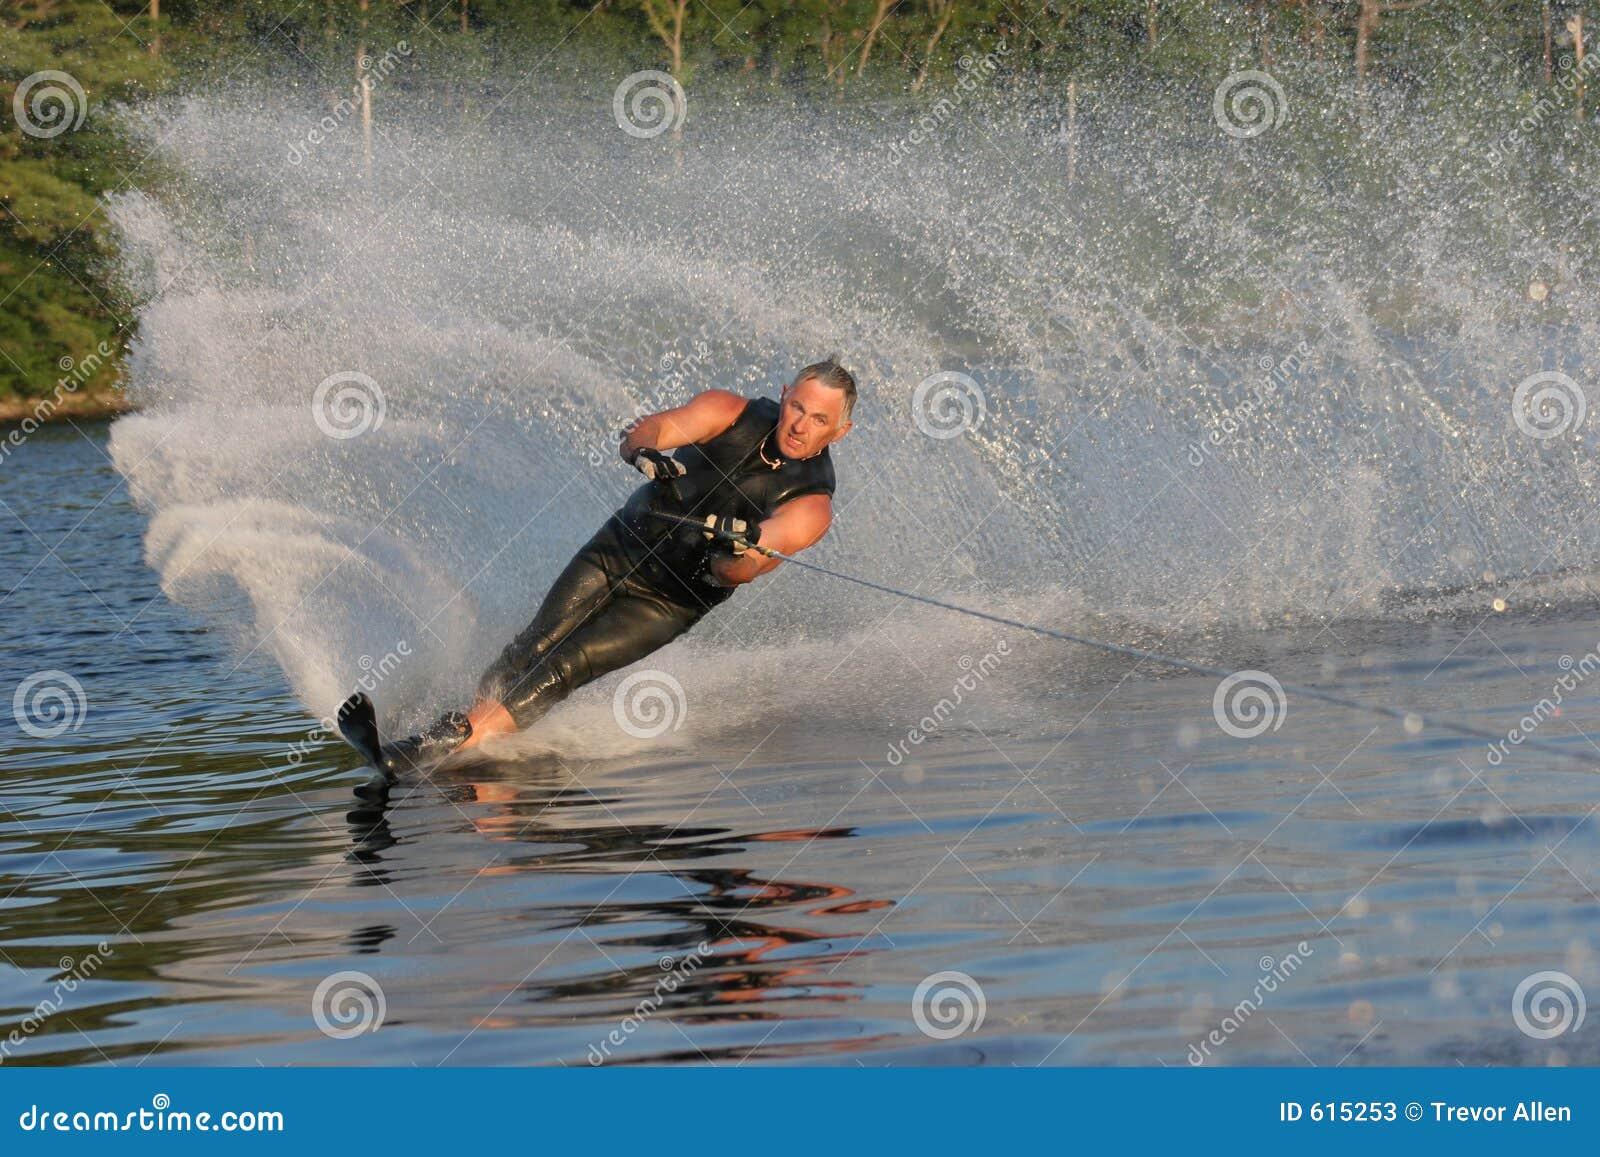 Waterskiing in the Summer